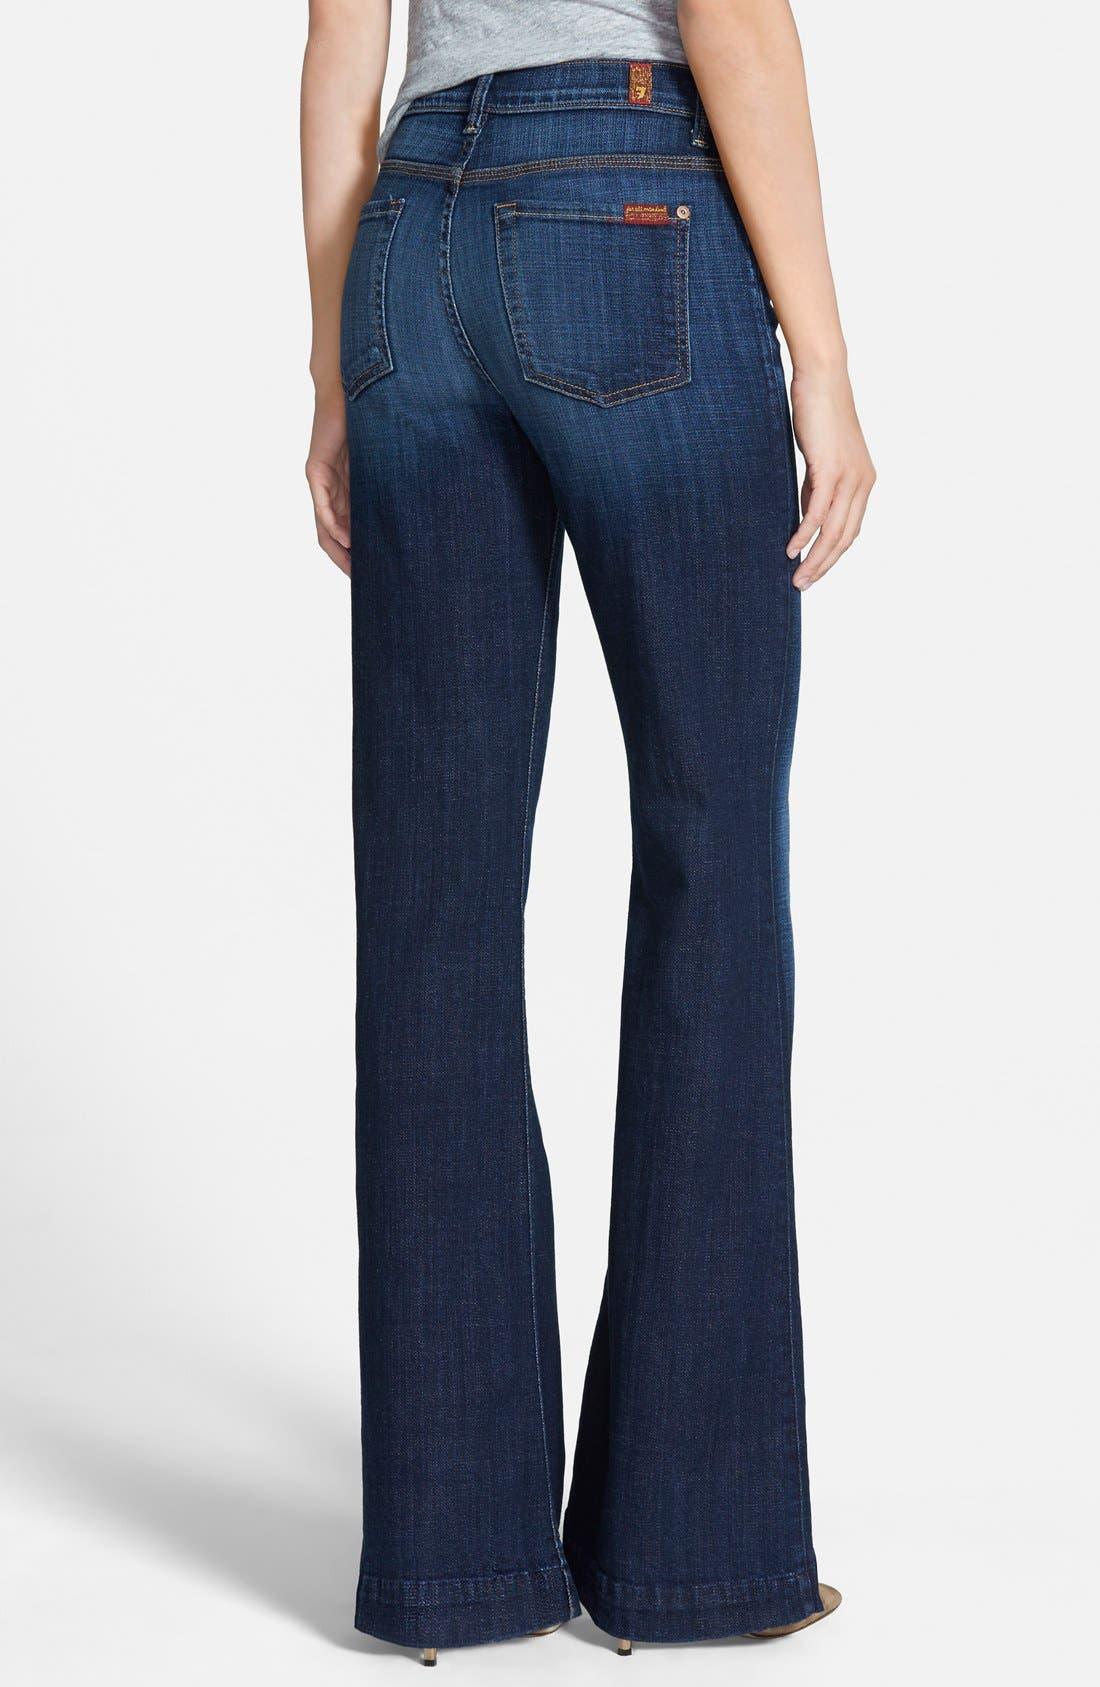 'Ginger' High Rise Flare Jeans,                             Alternate thumbnail 3, color,                             400